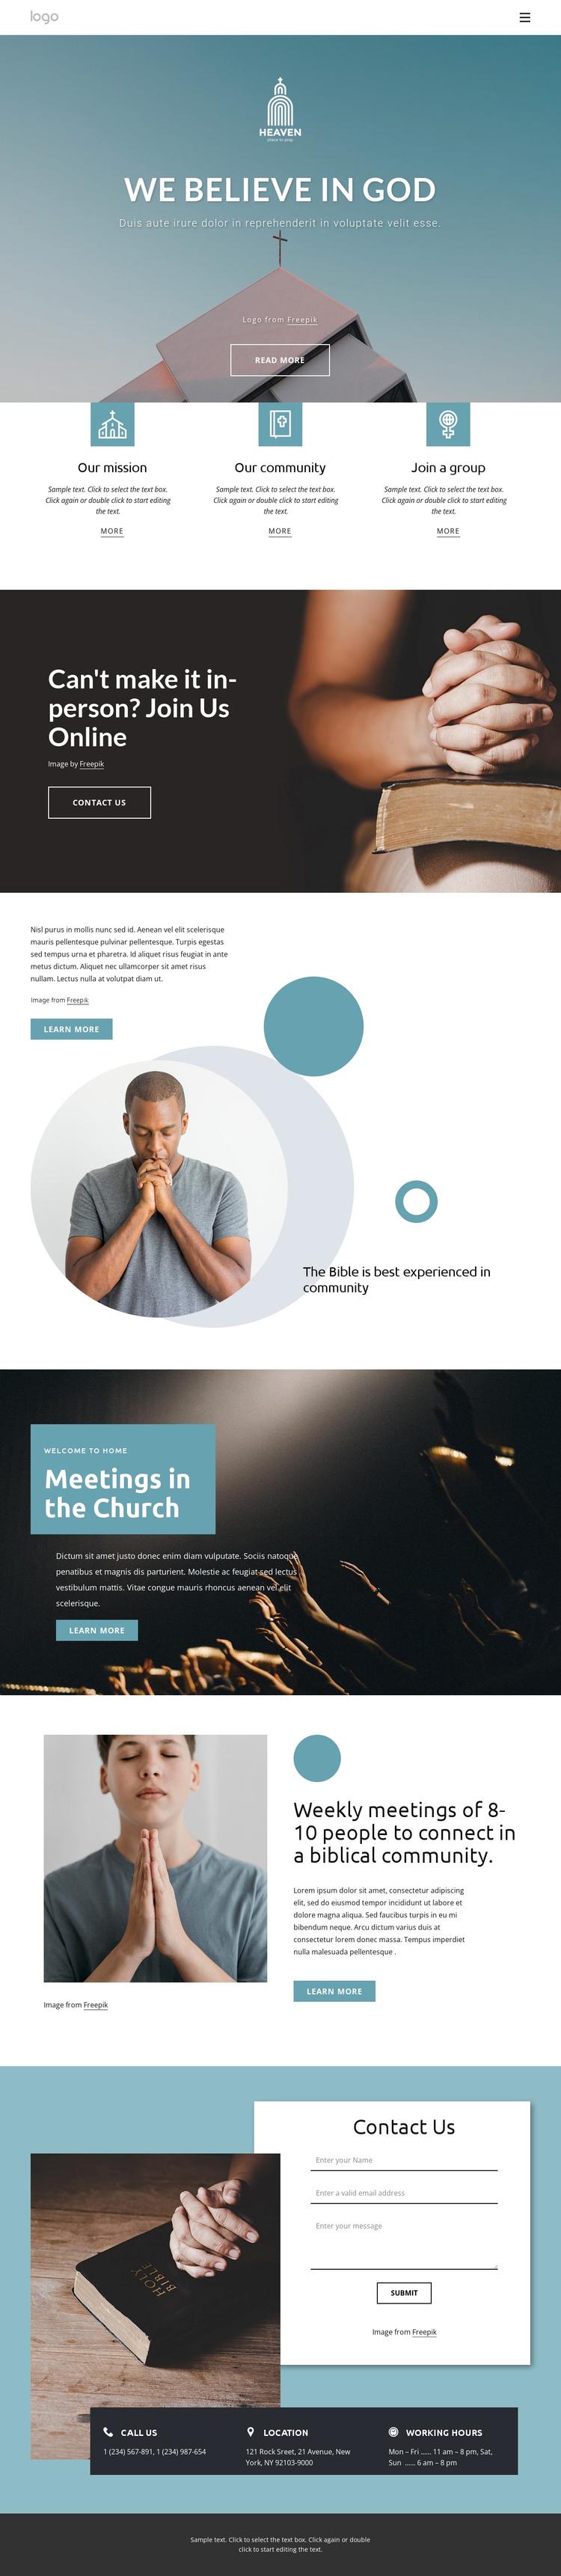 Family friendly church Website Builder Software